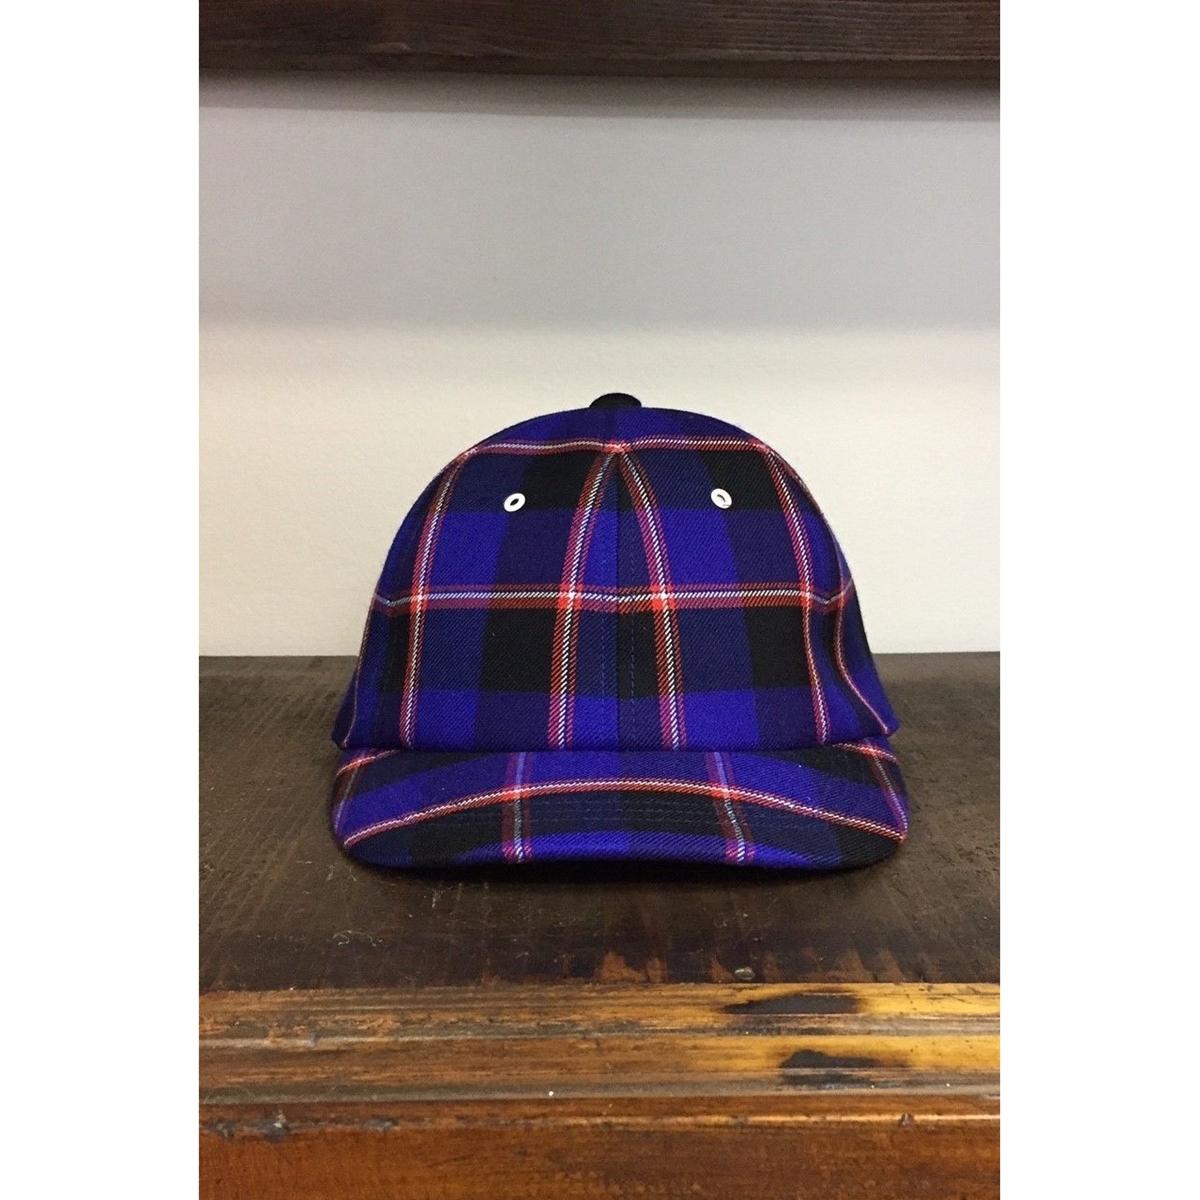 UNITUS Maasai Check Cap (Blue Check) UTSFW18-A02 ユナイタス マサイチェック キャップ チェック メンズ 送料無料